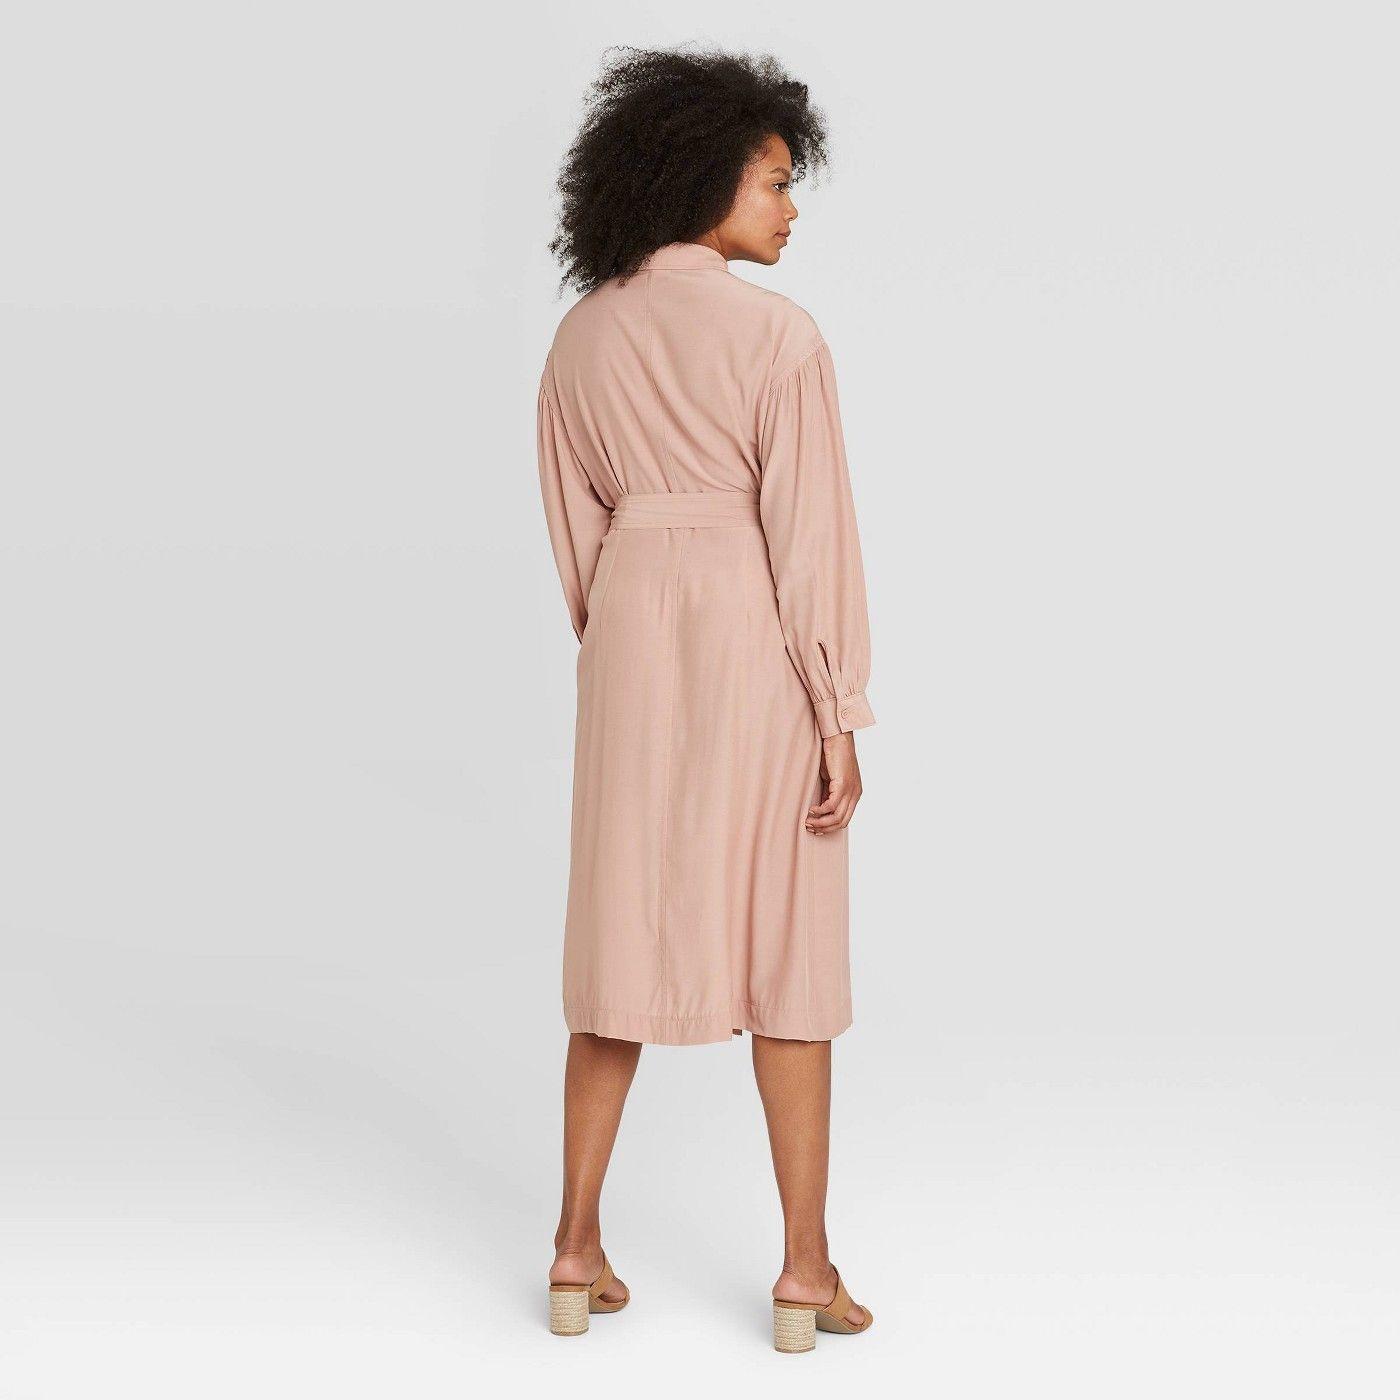 Women S Long Sleeve Drapey Button Dress Prologue Sponsored Sleeve Paid Long Women Women Long Sleeve Womens Tank Dress Button Dress [ 1400 x 1400 Pixel ]